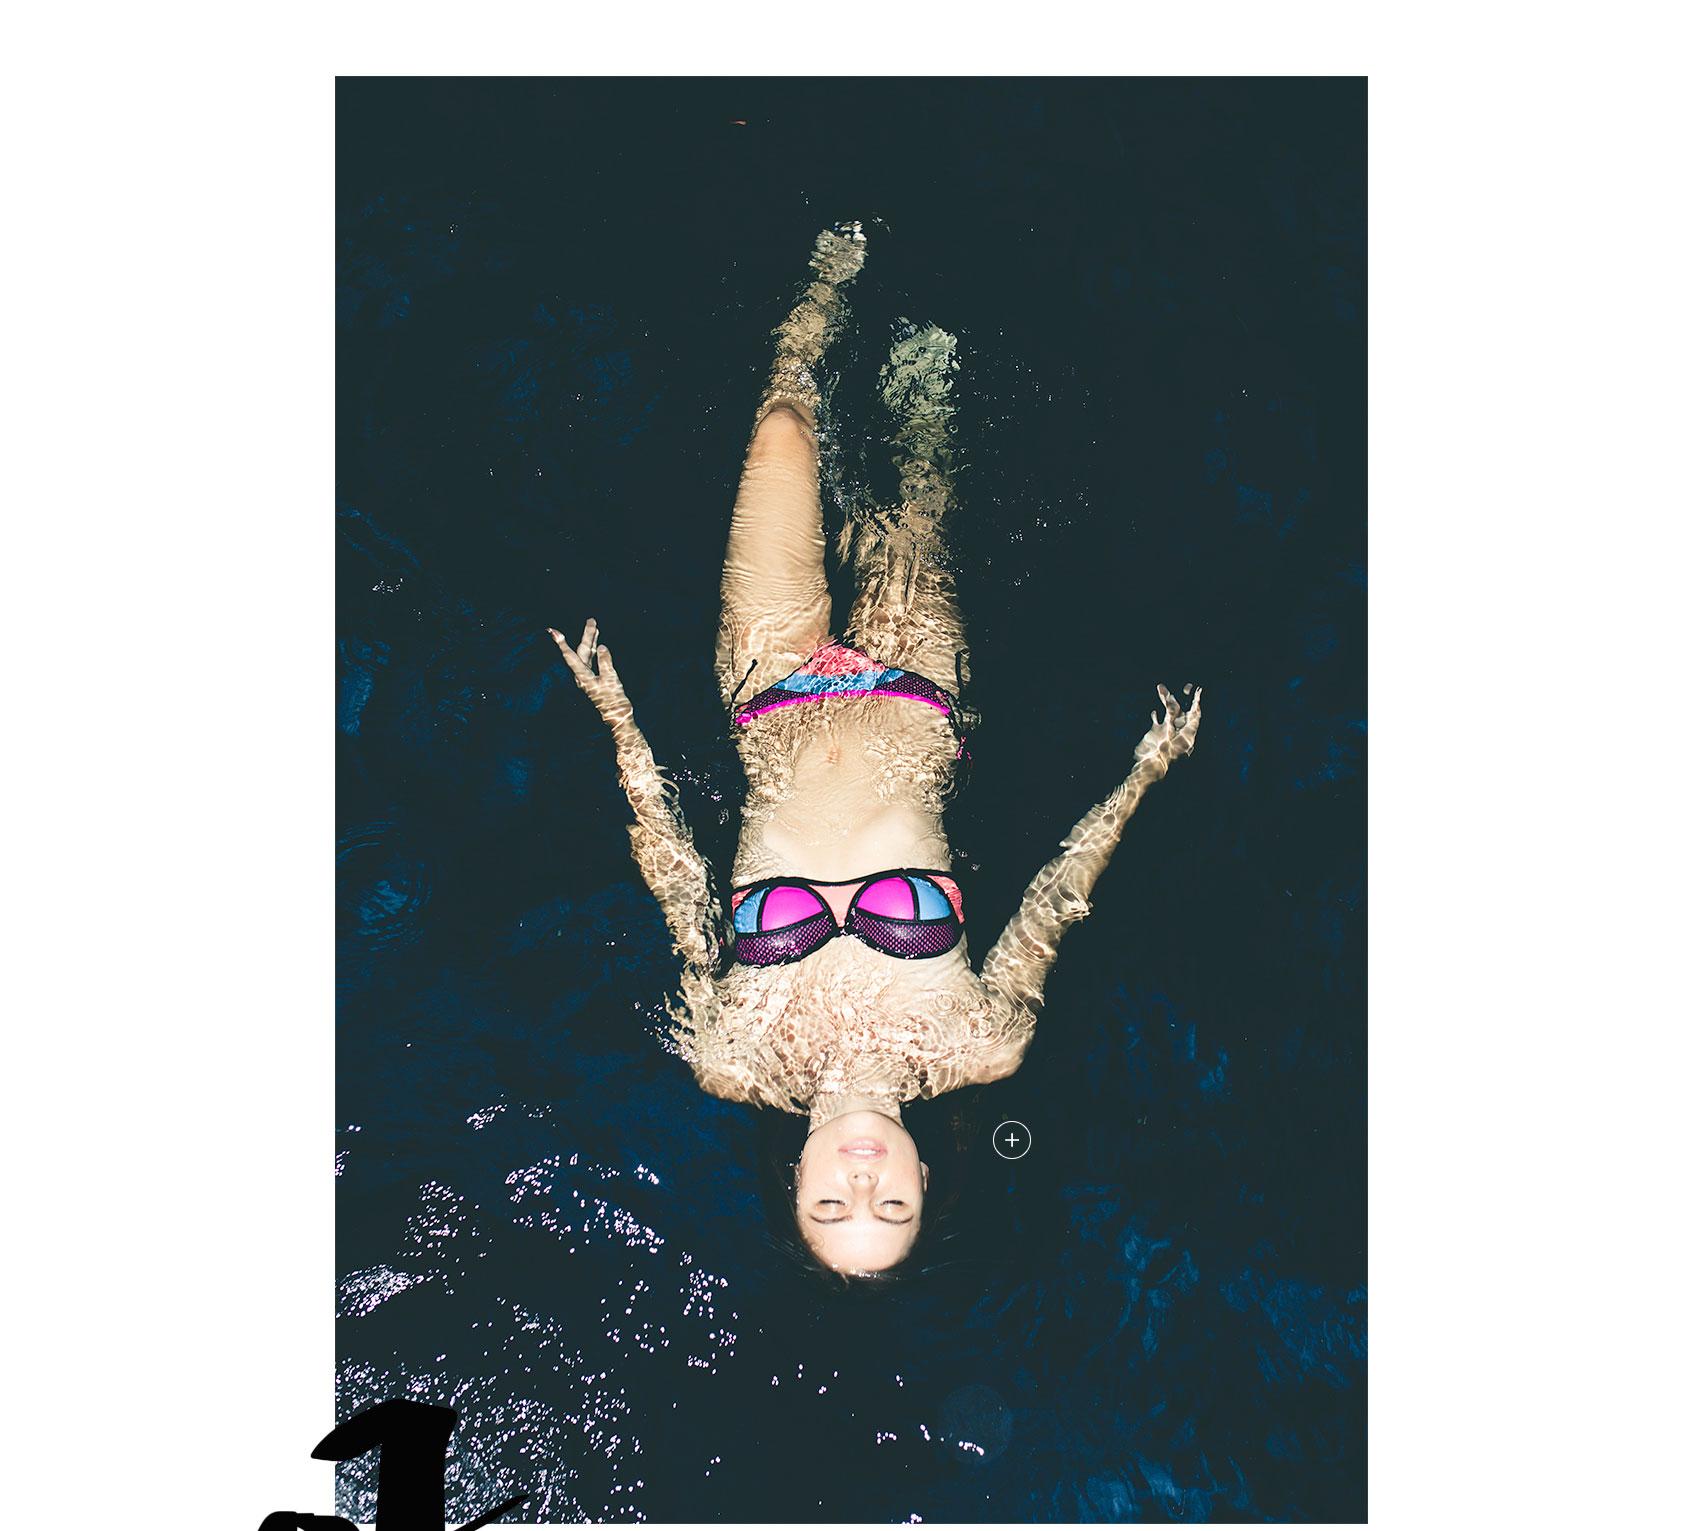 adult-swim-prev-lookbook_15.jpg